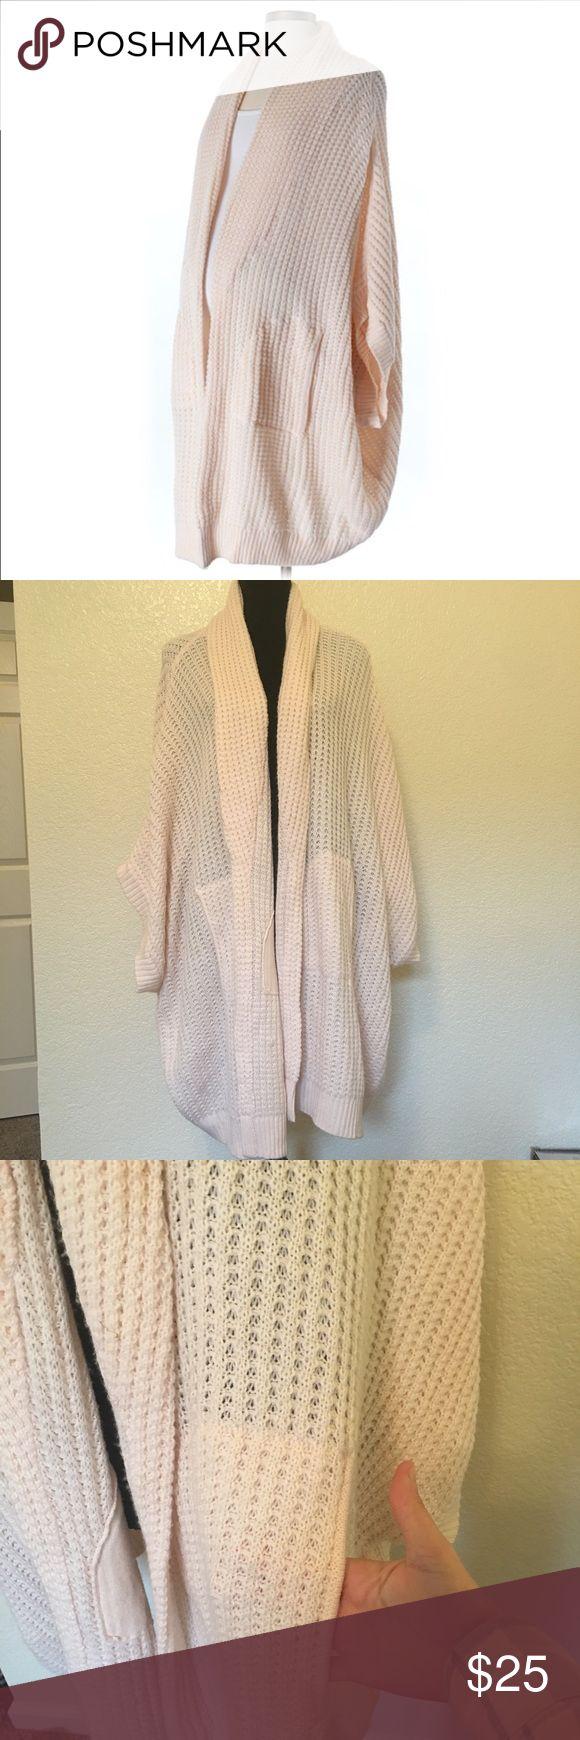 Jessica McCarthy plus size cardigan Jessica McCarthy open cardigan. Blush pink. Knit. Size 3X jessica mccarthy Sweaters Cardigans